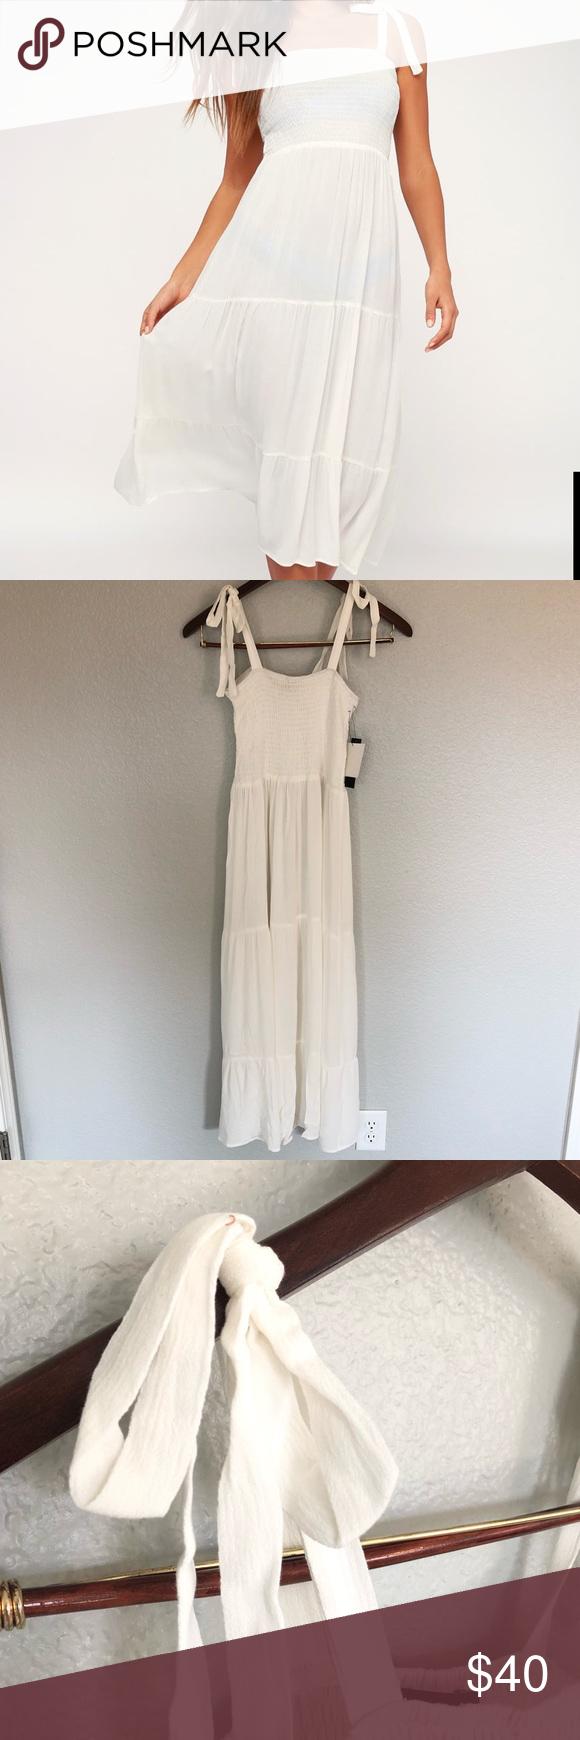 Lulus New Beach Coverup Tie Smocked Midi Dress Clothes Design Lulu Dresses Fashion Design [ 1740 x 580 Pixel ]